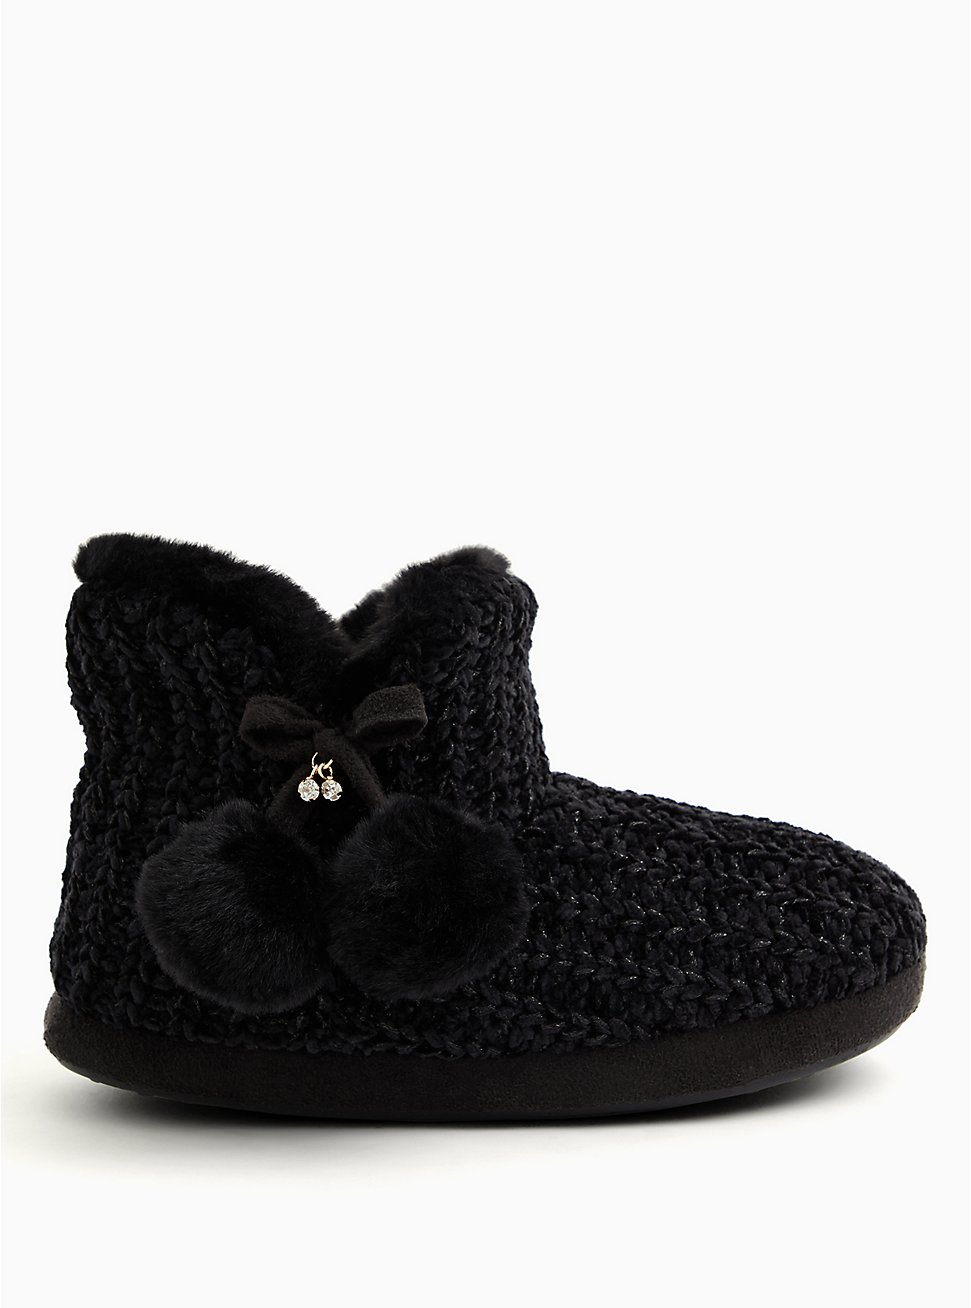 Black Chenille Bootie Slipper (WW), BLACK, hi-res